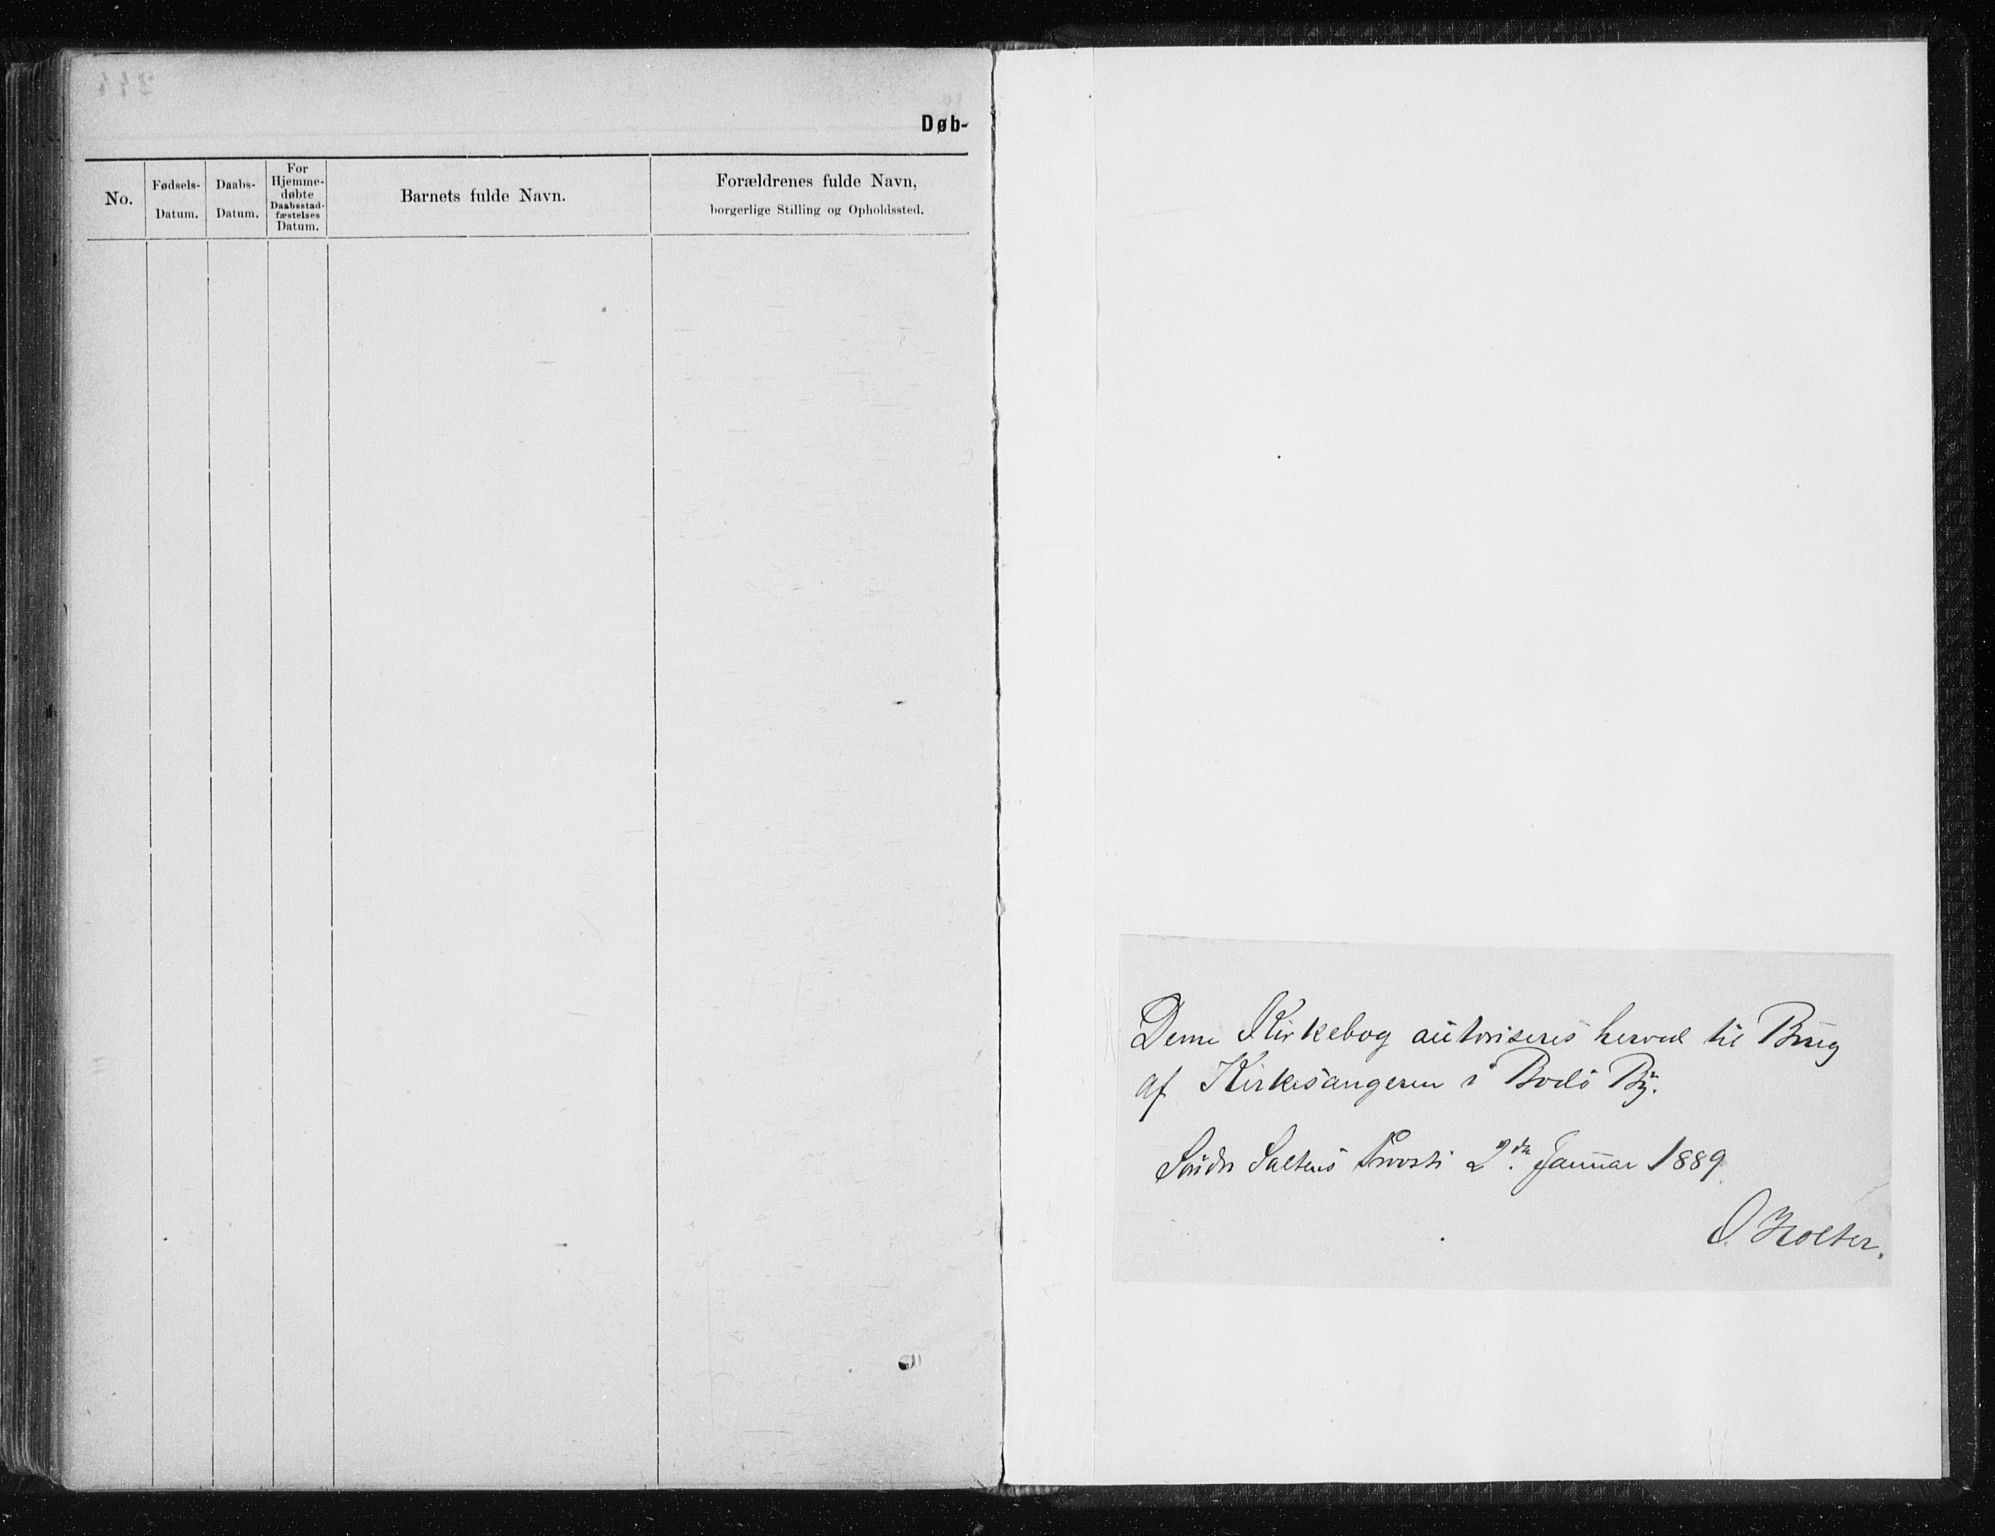 SAT, Ministerialprotokoller, klokkerbøker og fødselsregistre - Nordland, 801/L0032: Klokkerbok nr. 801C07, 1889-1897